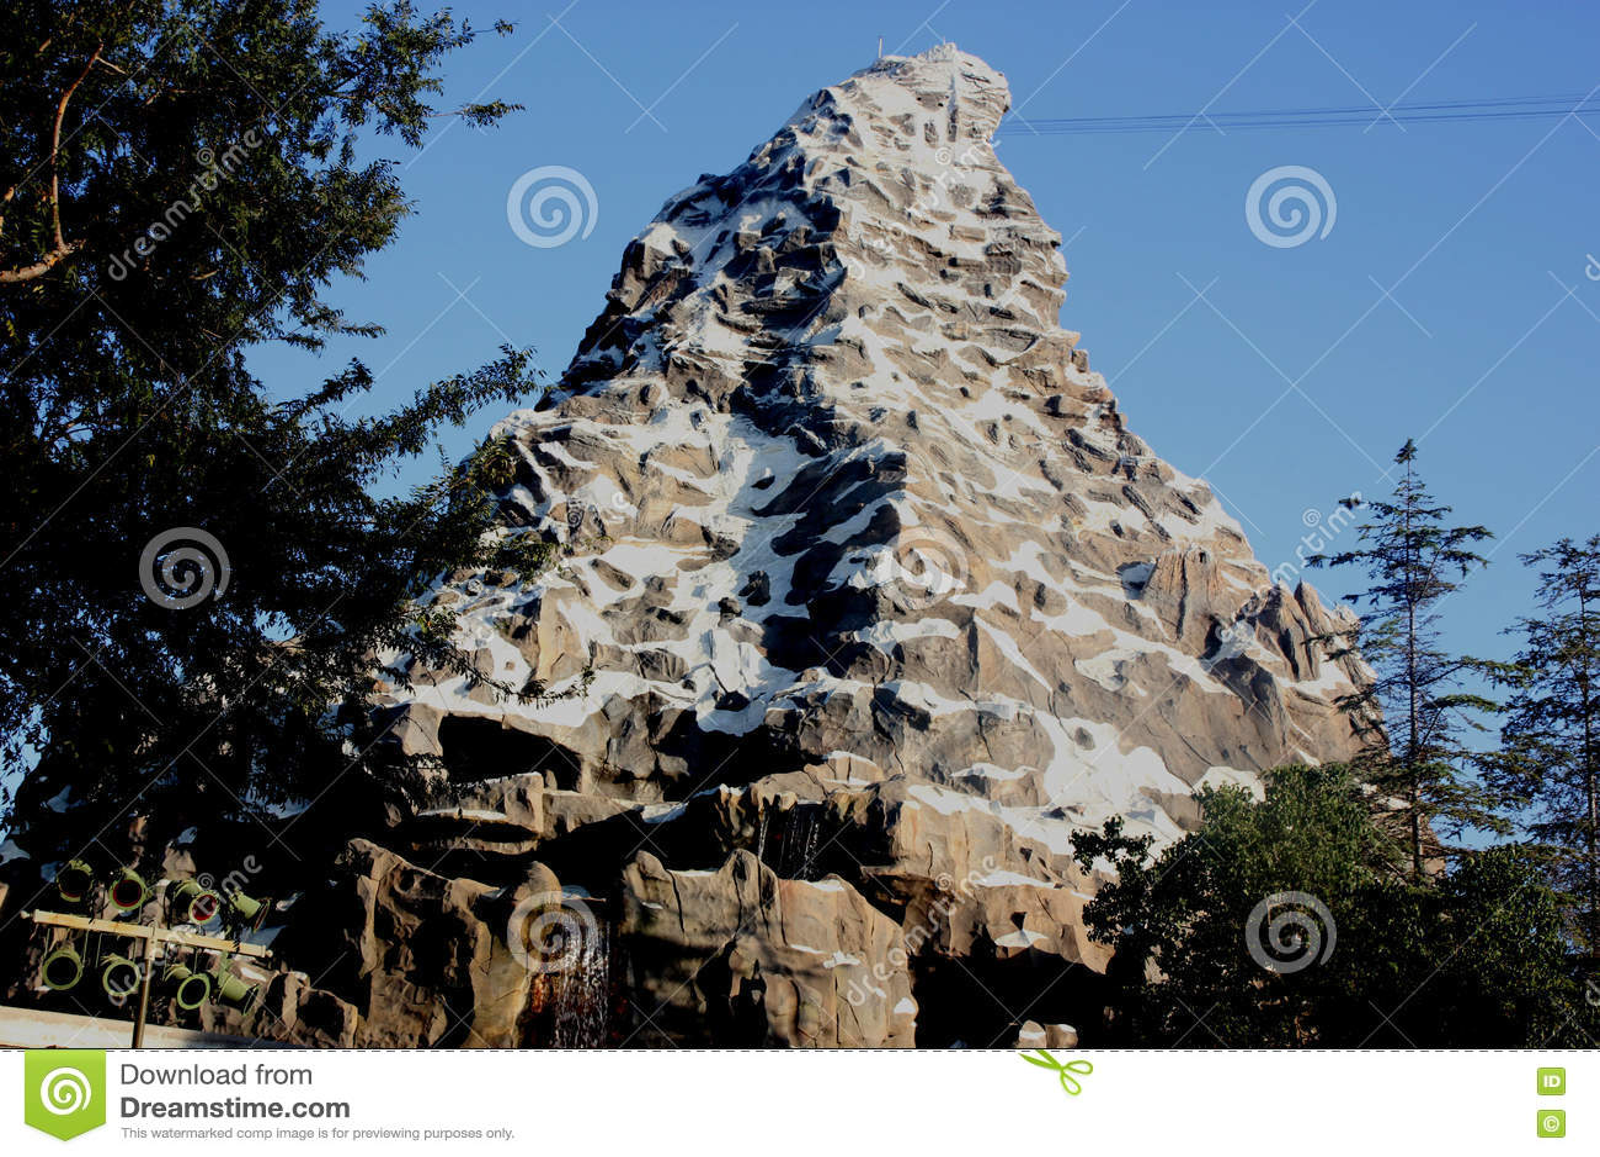 Matterhorn Bobsleds Disneyland Fantasyland Anaheim California